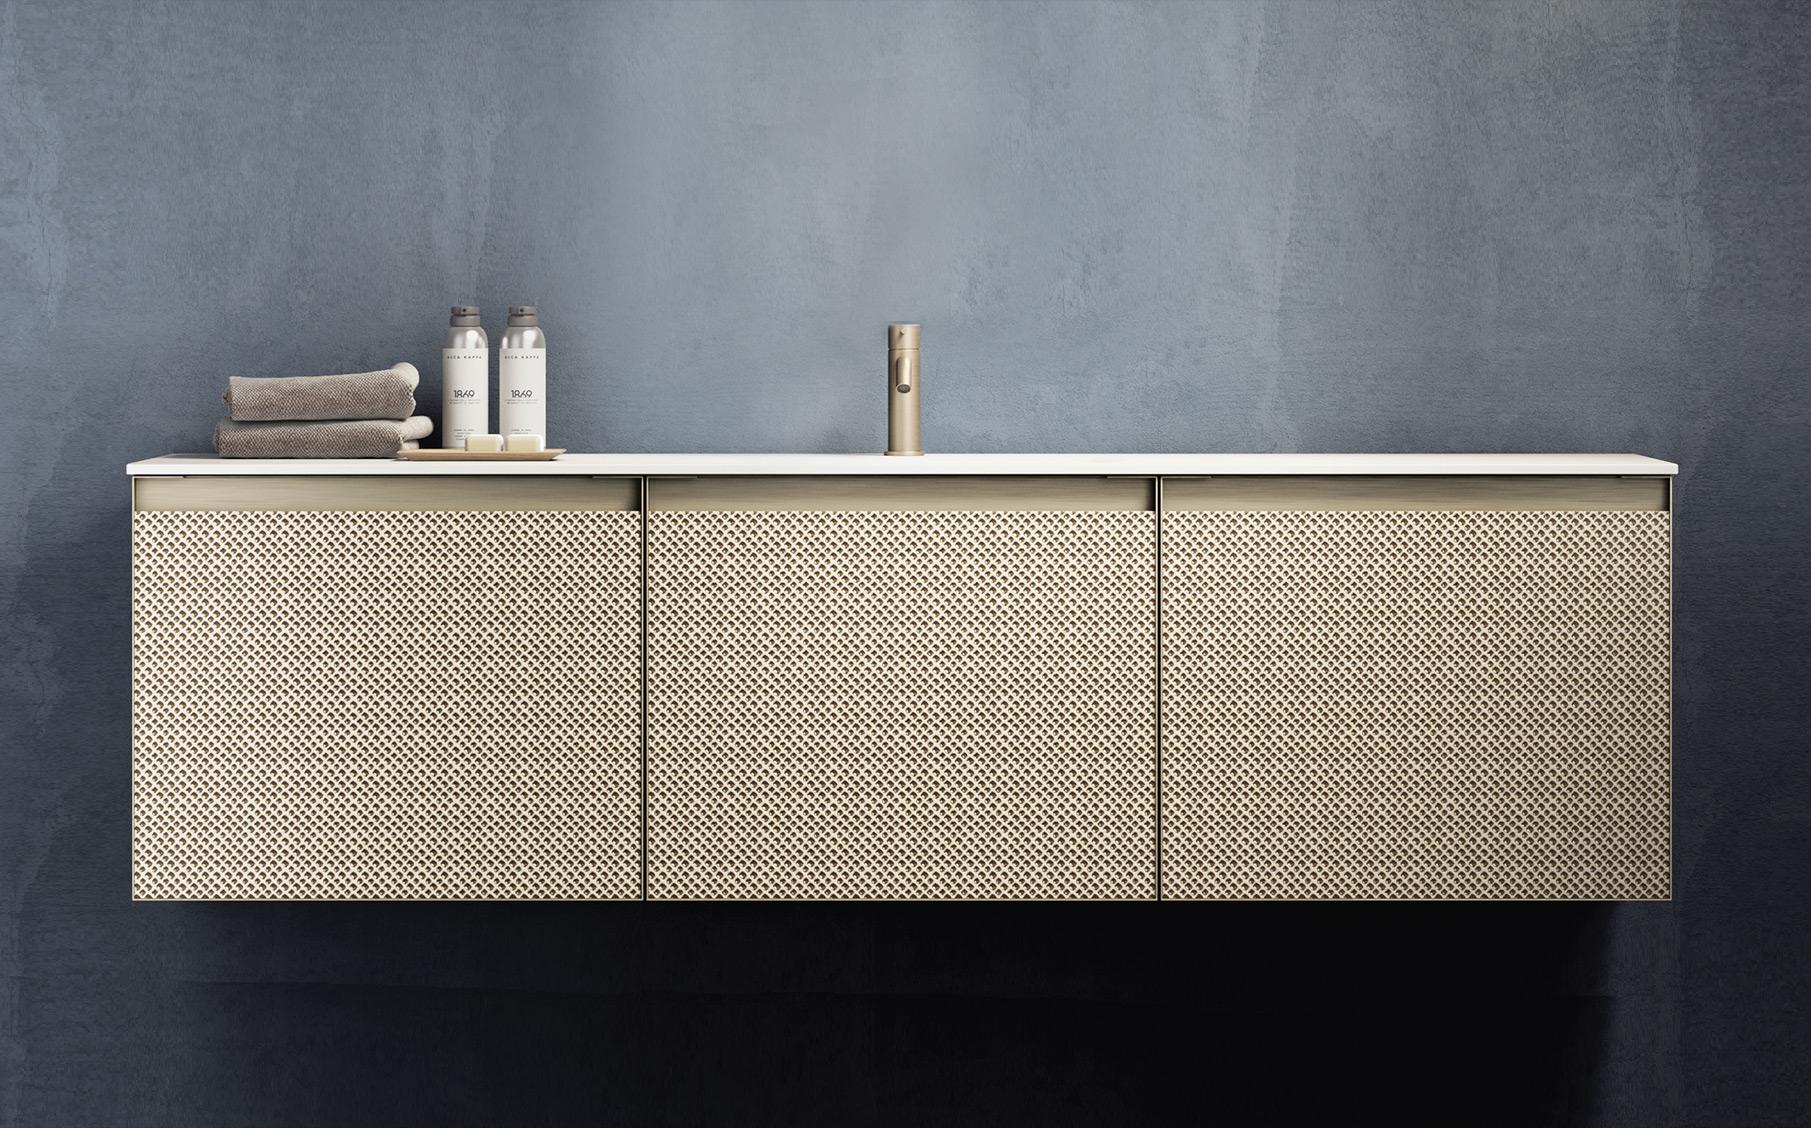 Bathroom, Design, Bathroom furnishing, Contemporary bathroom ...